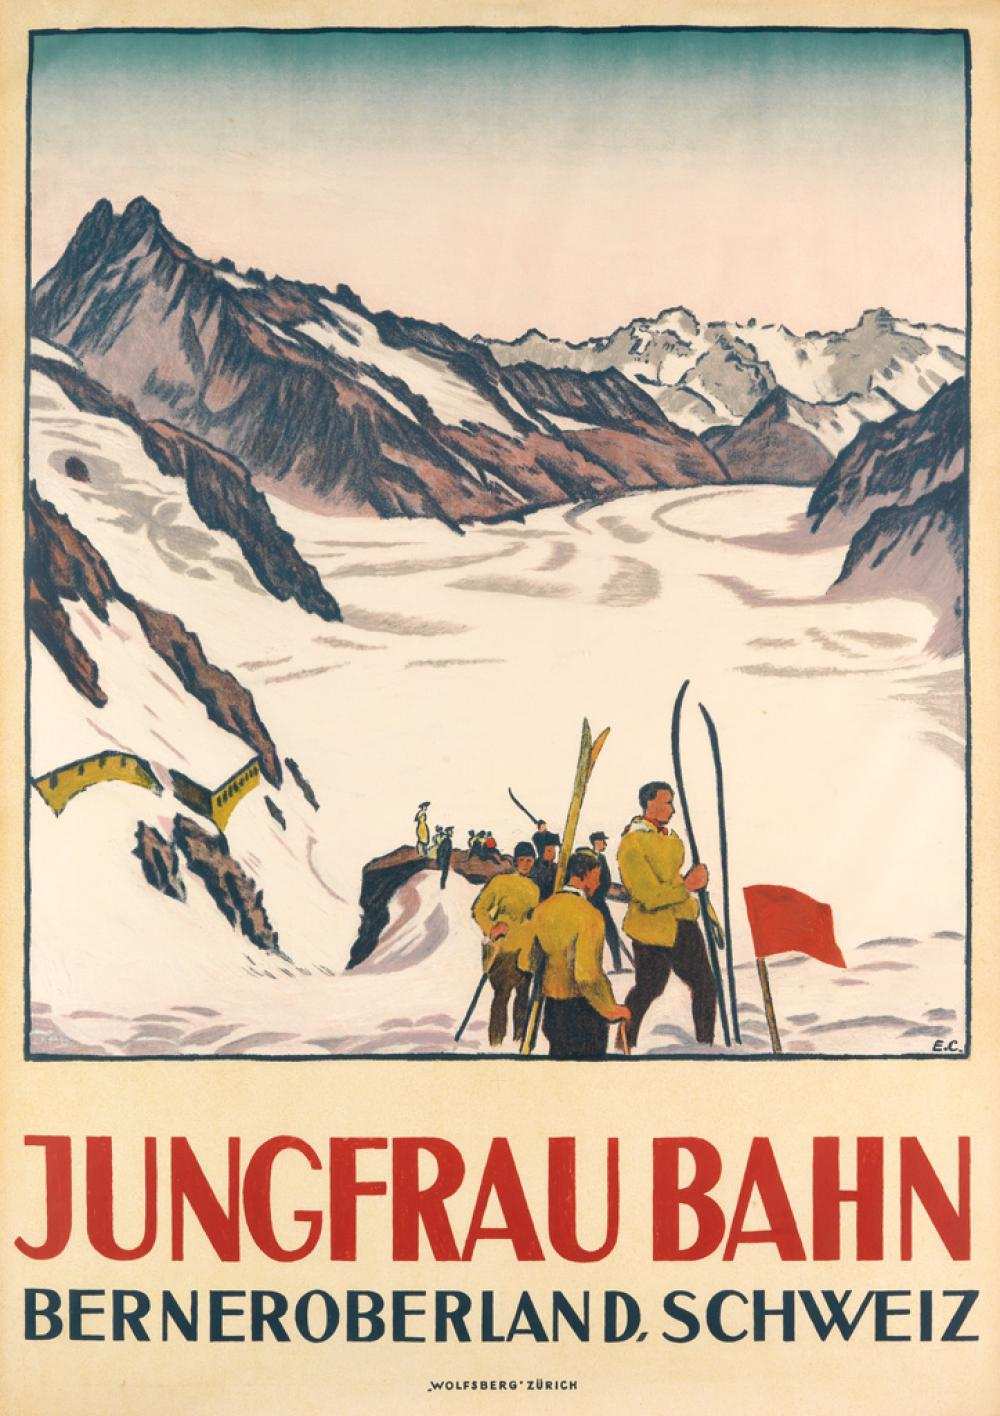 EMIL CARDINAUX (1877-1936). JUNGFRAU BAHN. 1919. 50x35 inches, 127x90 cm. Wolfsberg, Zurich.